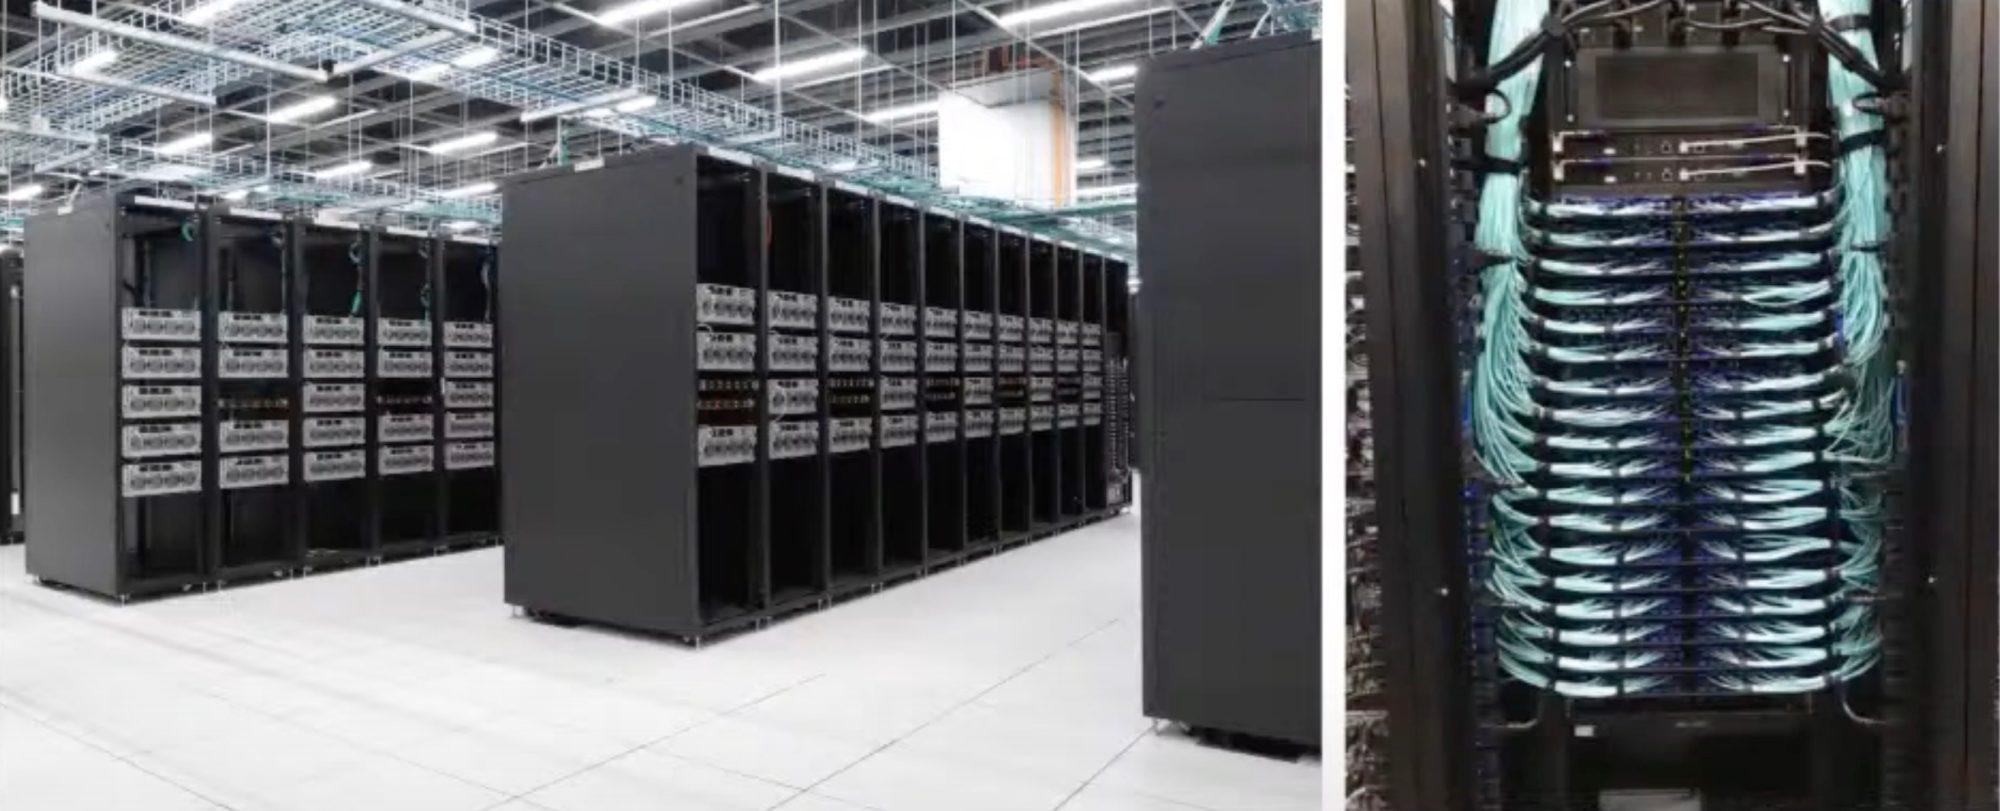 Tesla-Supercomputer